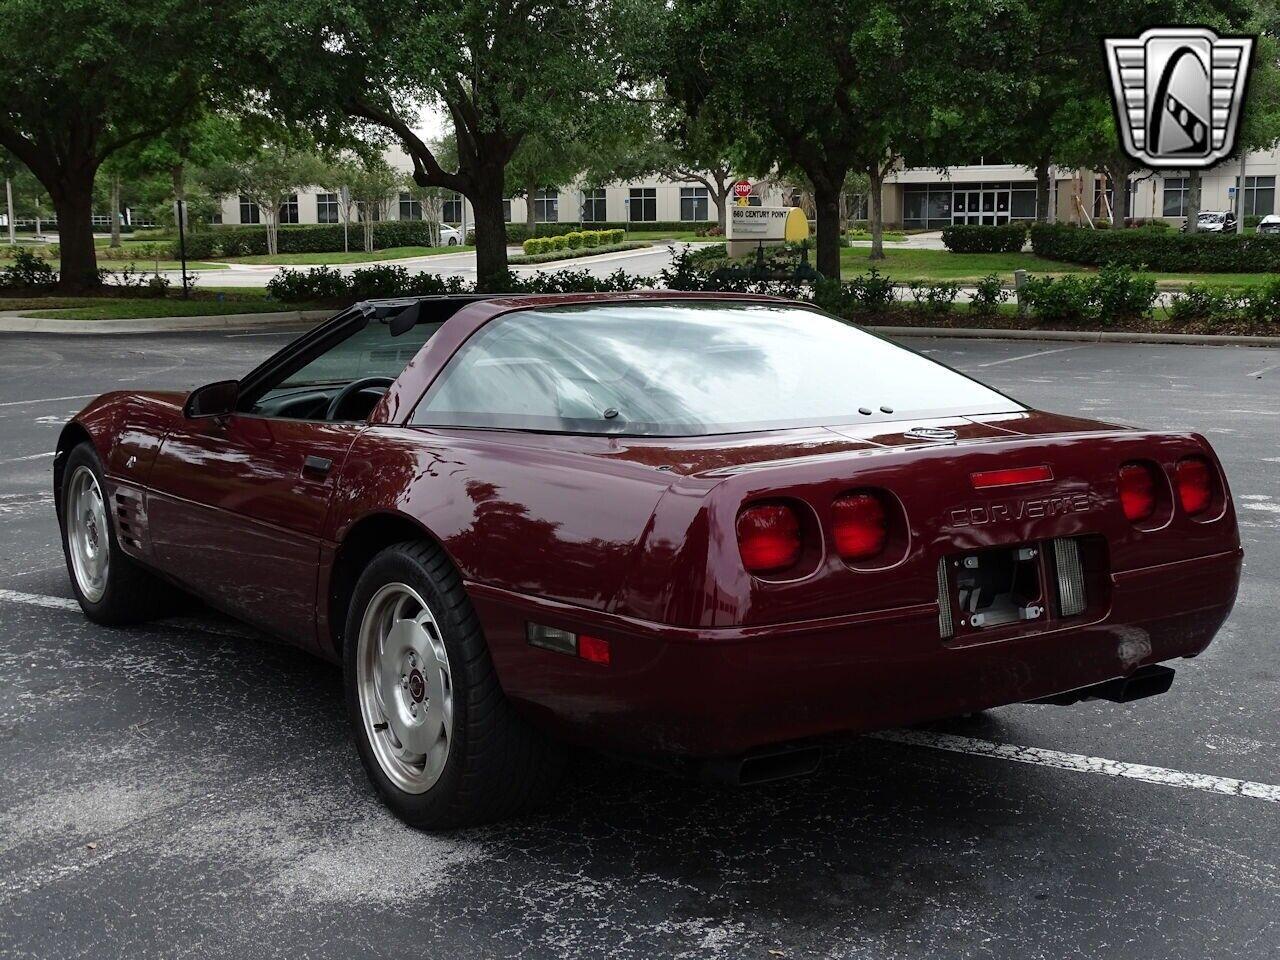 1993 Red Chevrolet Corvette     C4 Corvette Photo 6